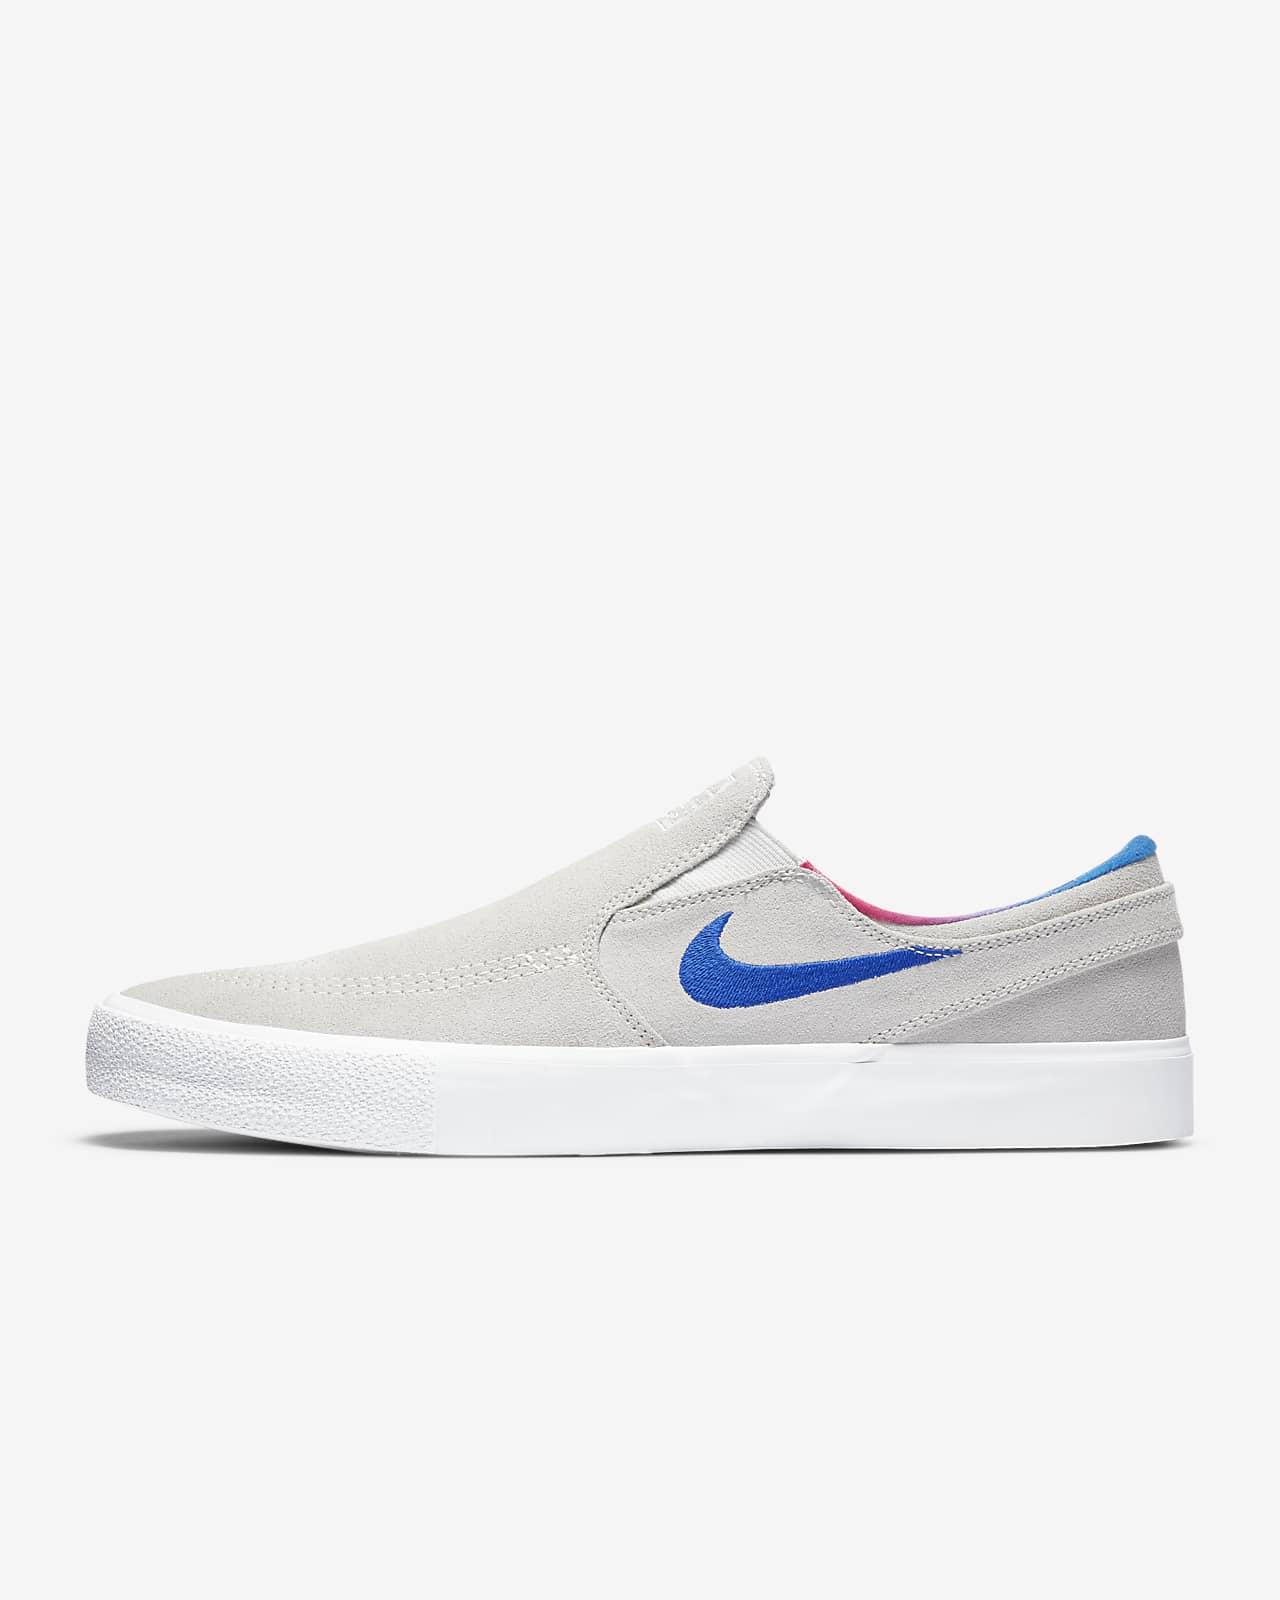 Enorme software Reducción  Nike SB Zoom Stefan Janoski Slip RM T Skate Shoe. Nike JP